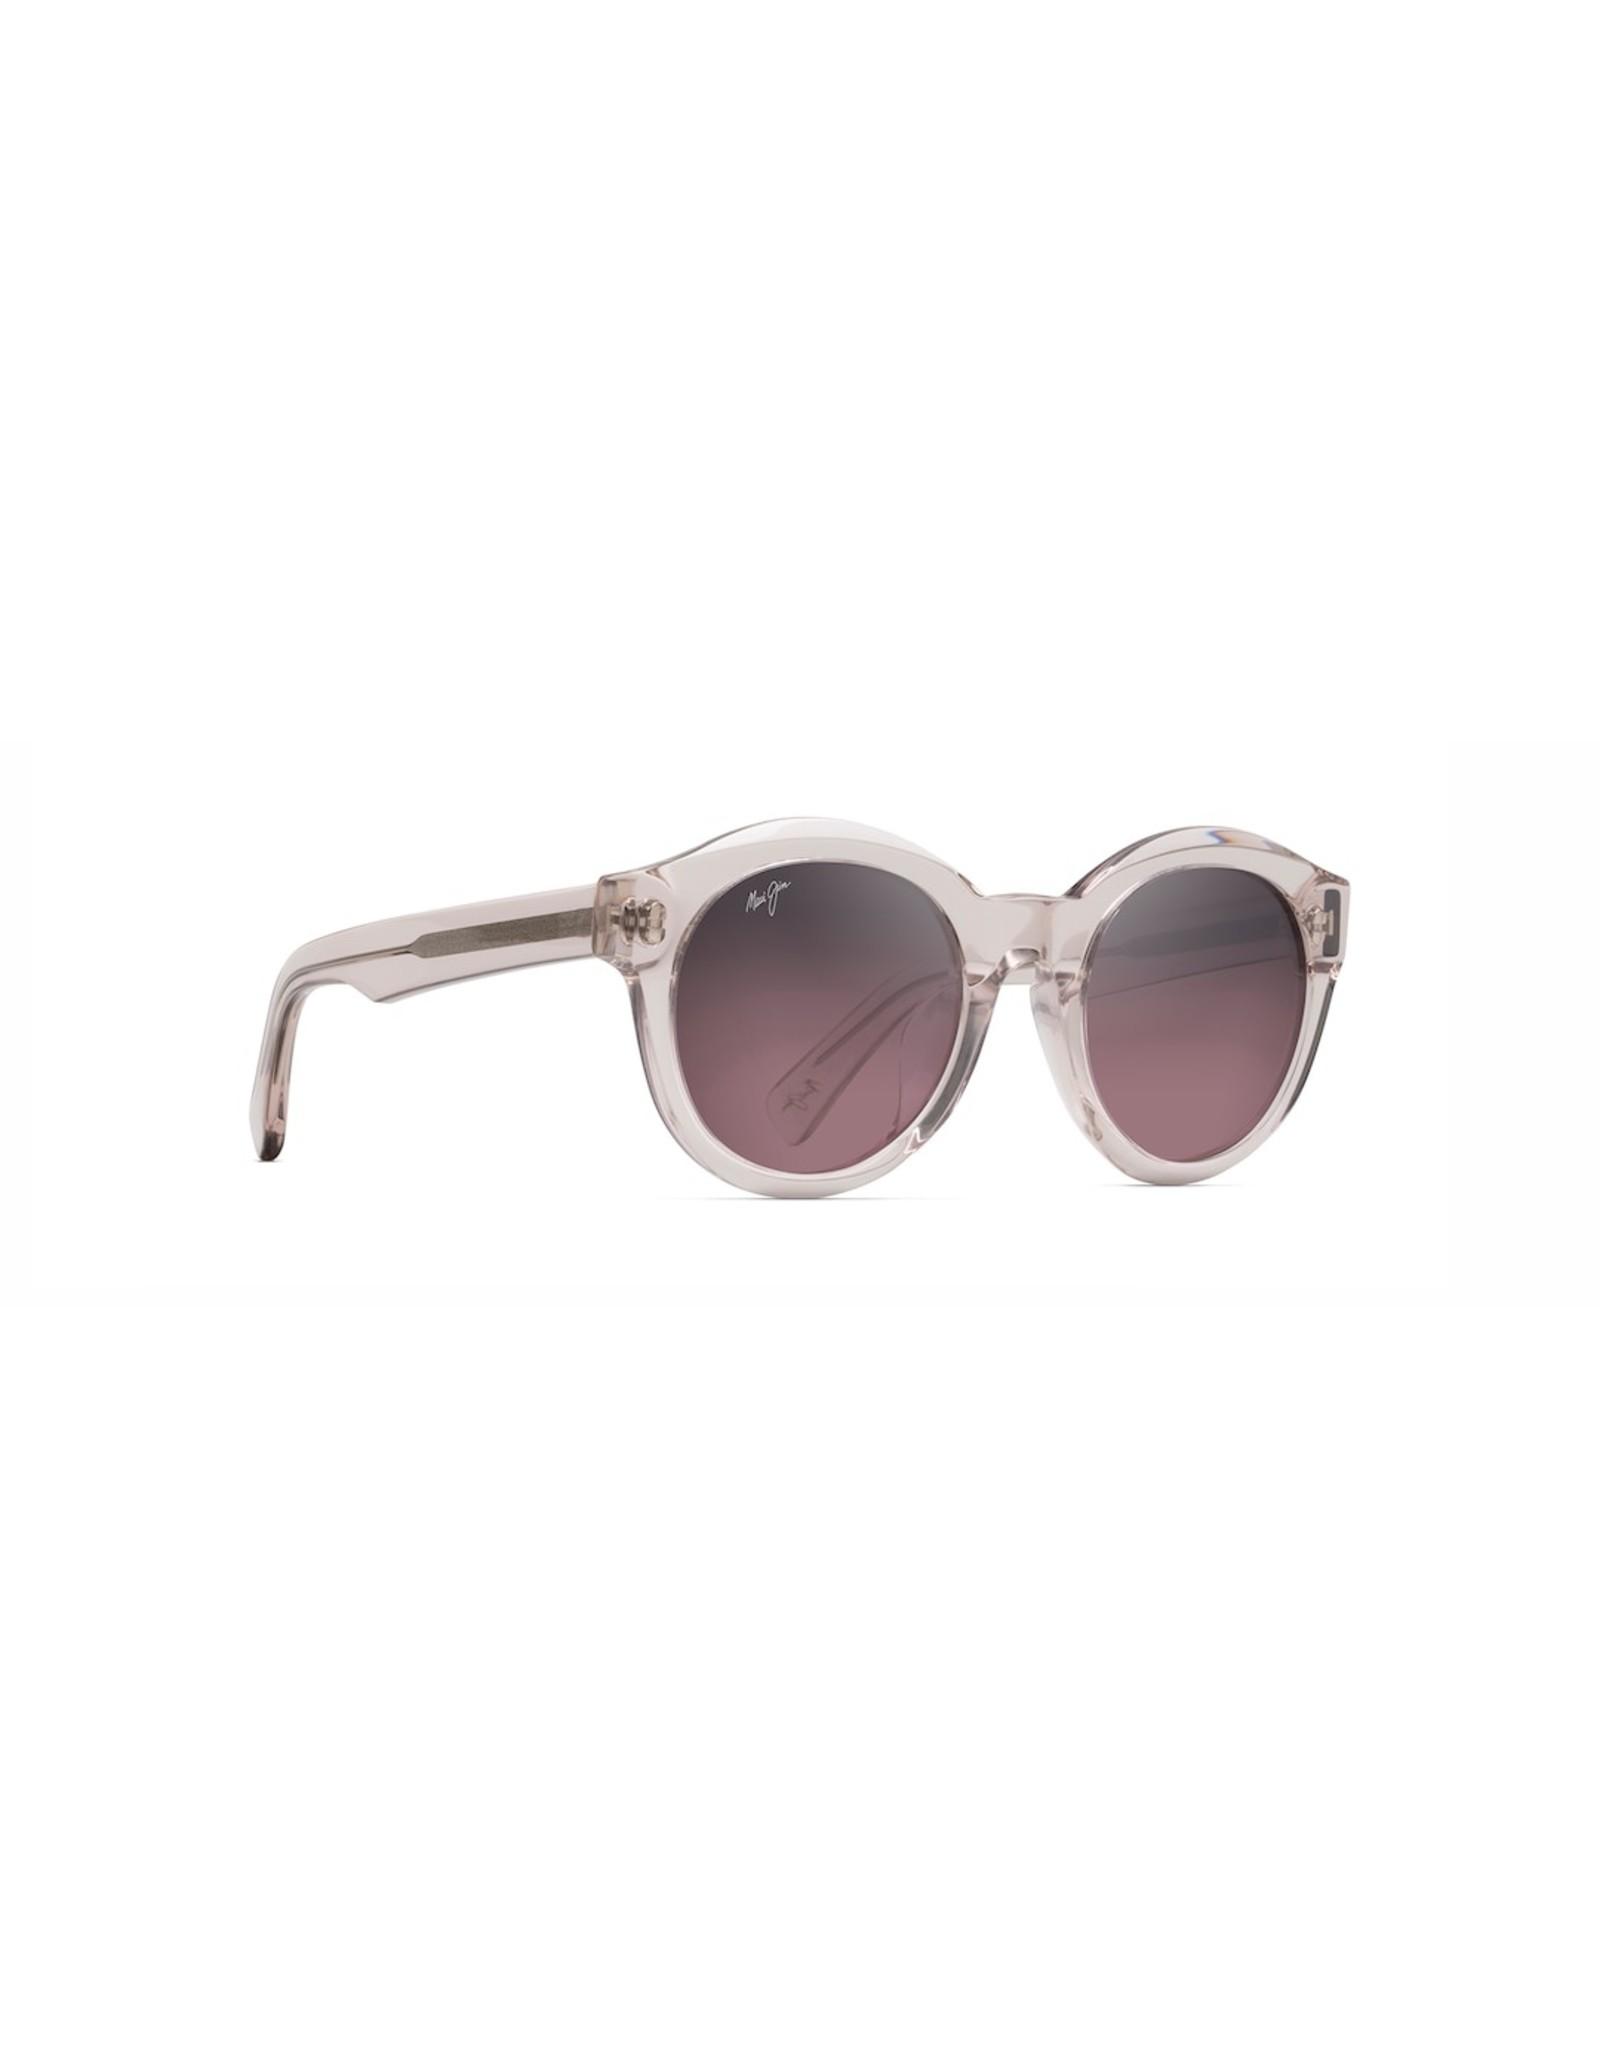 Maui Jim Maui Jim 'Jasmine' Sunglasses